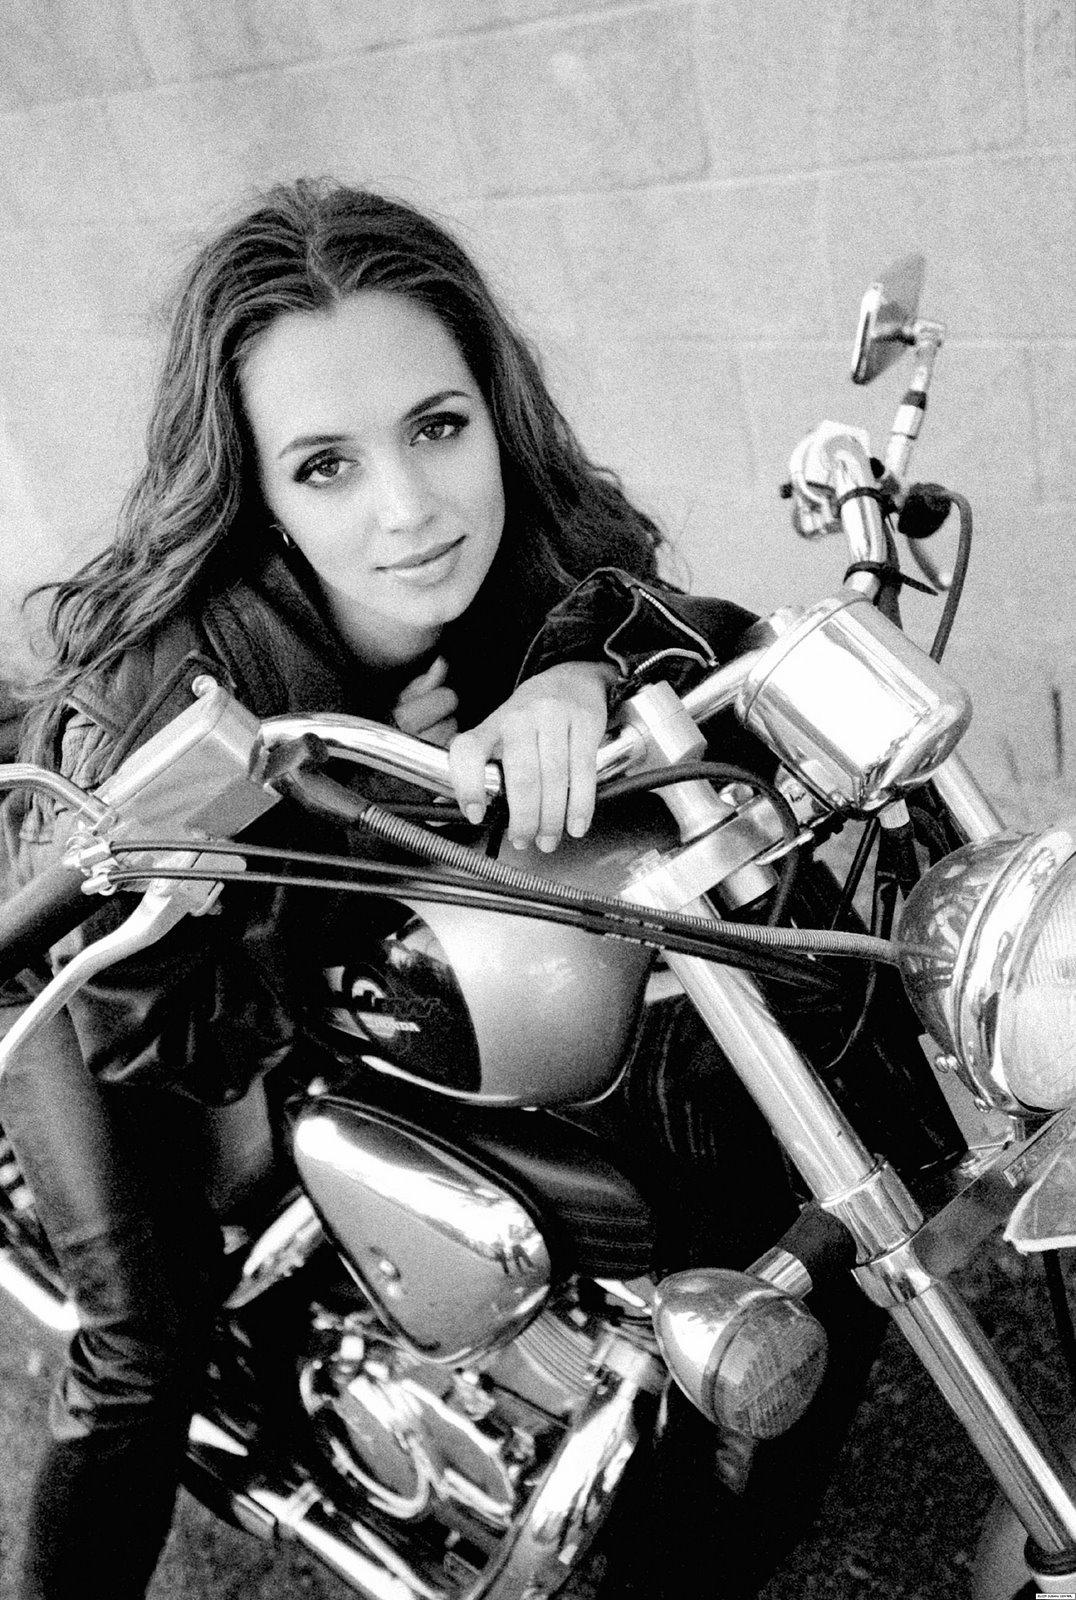 Eliza Dushku em moto, famosa em moto, gostosa em moto, Mulheres de moto, mulher sensual na moto, gostosa em moto, Mulher semi nua em moto, biker babe, sexy on bike, sexy on motorcycle, babes on bike, ragazza in moto, donna calda in moto,femme chaude sur la moto,mujer caliente en motocicleta, chica en moto,